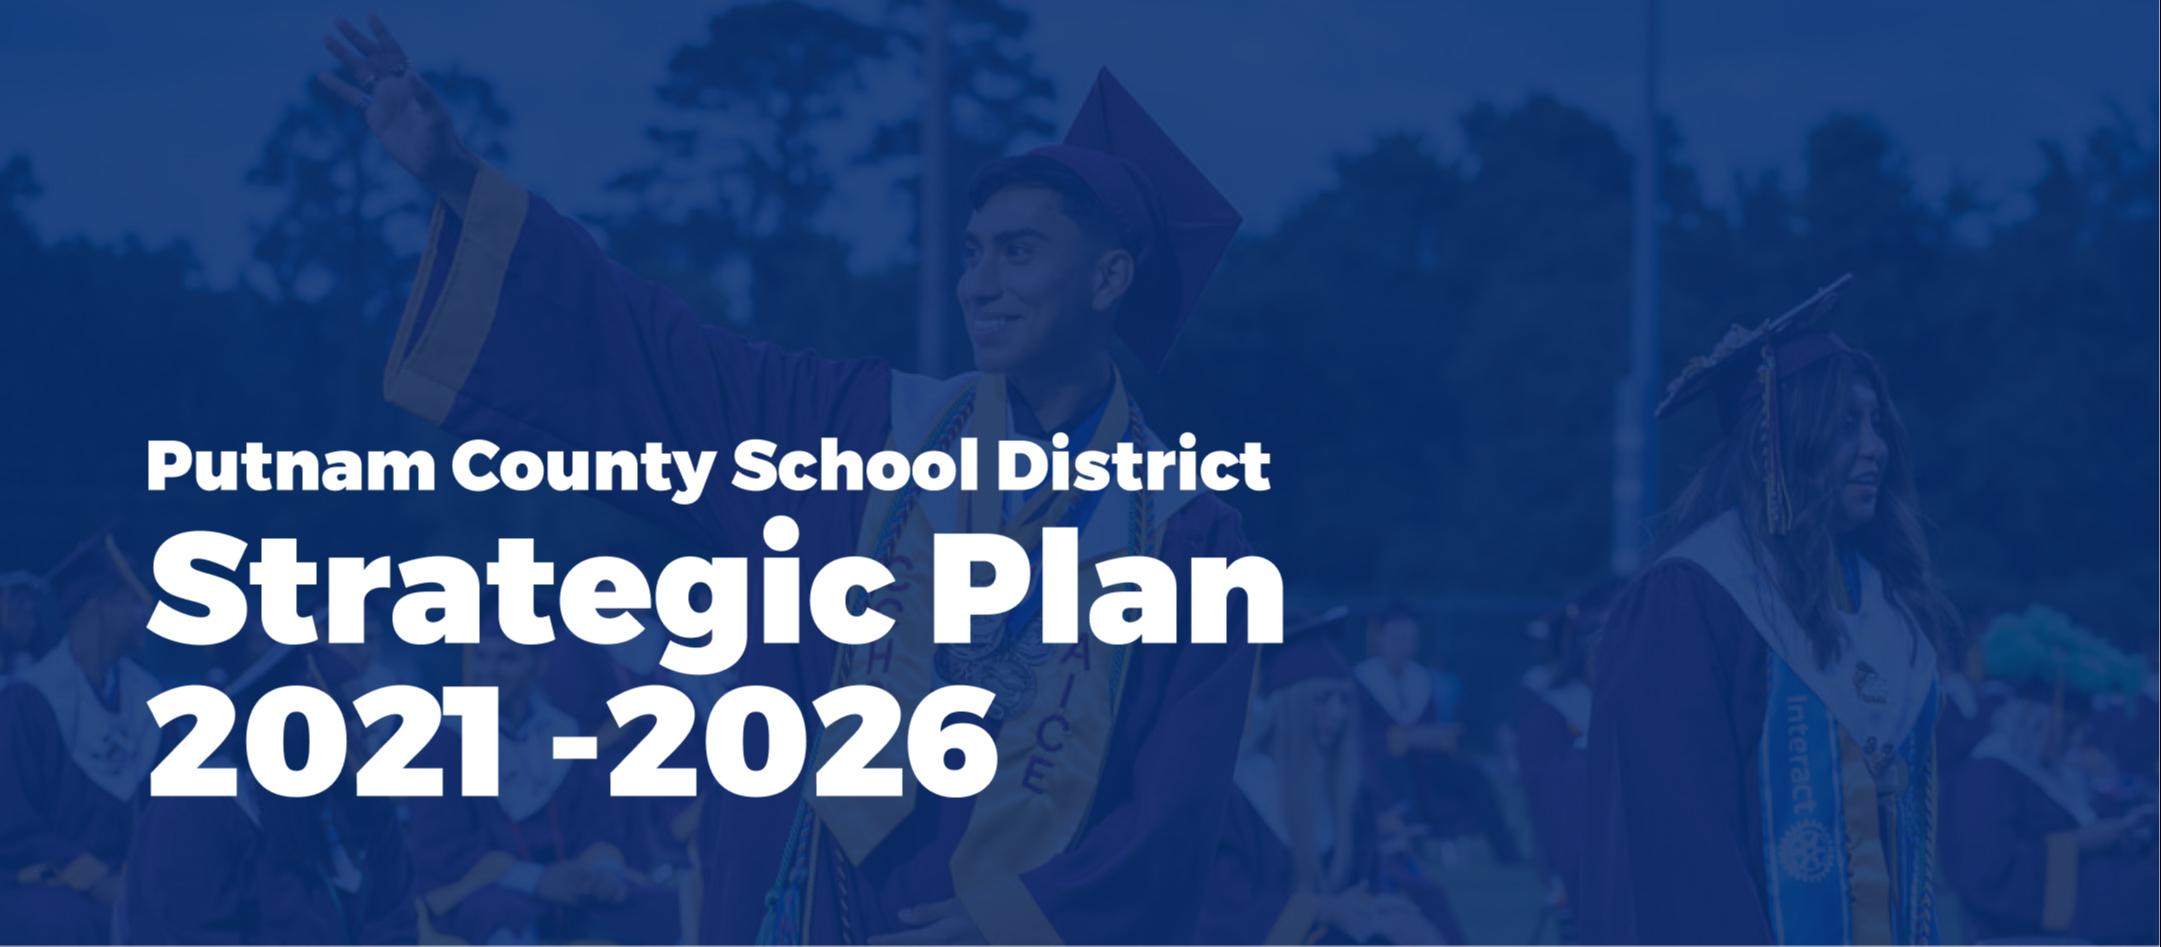 strategic plan 2021 2026 cover image smiling student